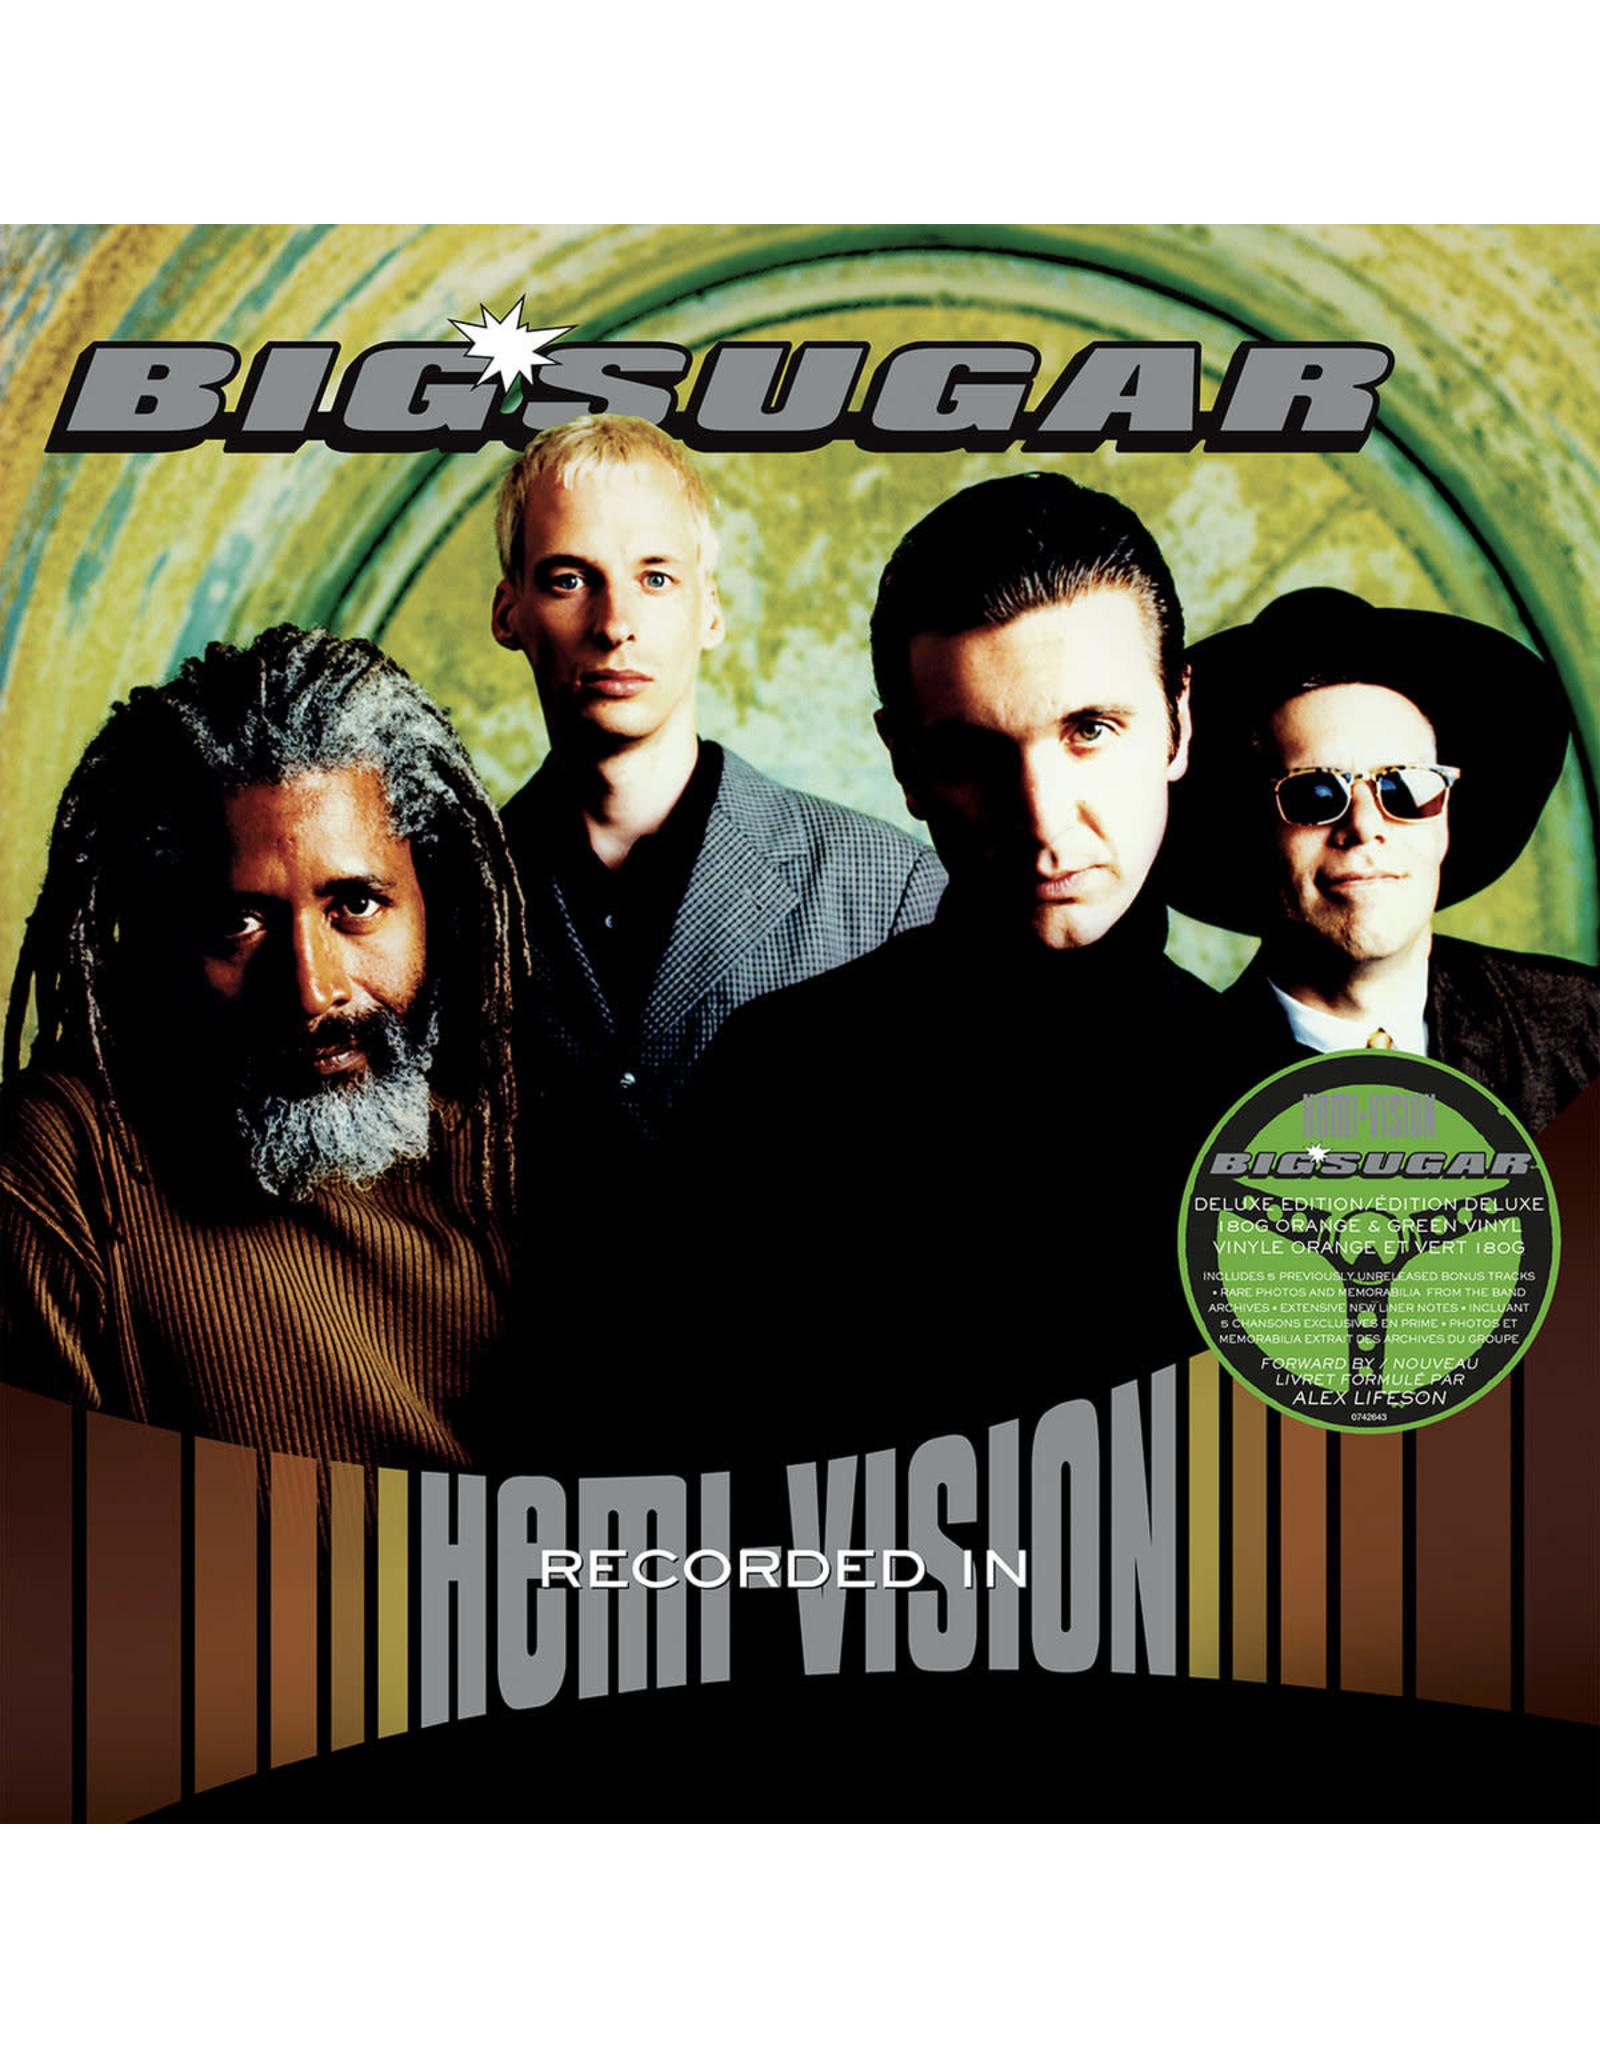 Big Sugar - Hemi-Vision  (Deluxe Edition) [Orange and Green Vinyl]